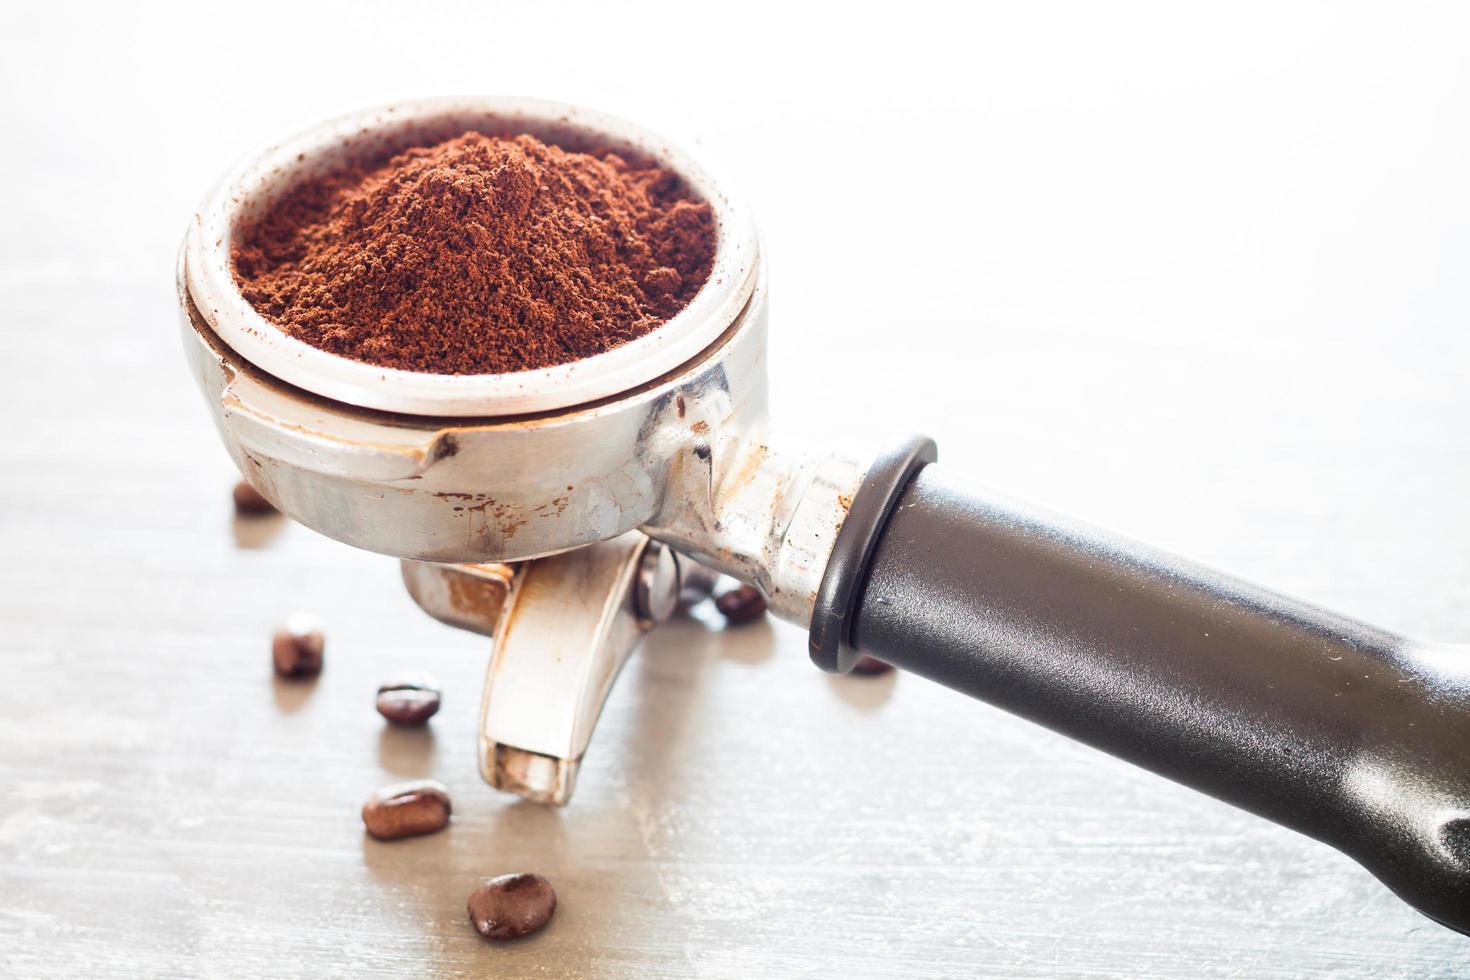 kaffebönor och en kaffekvarn foto